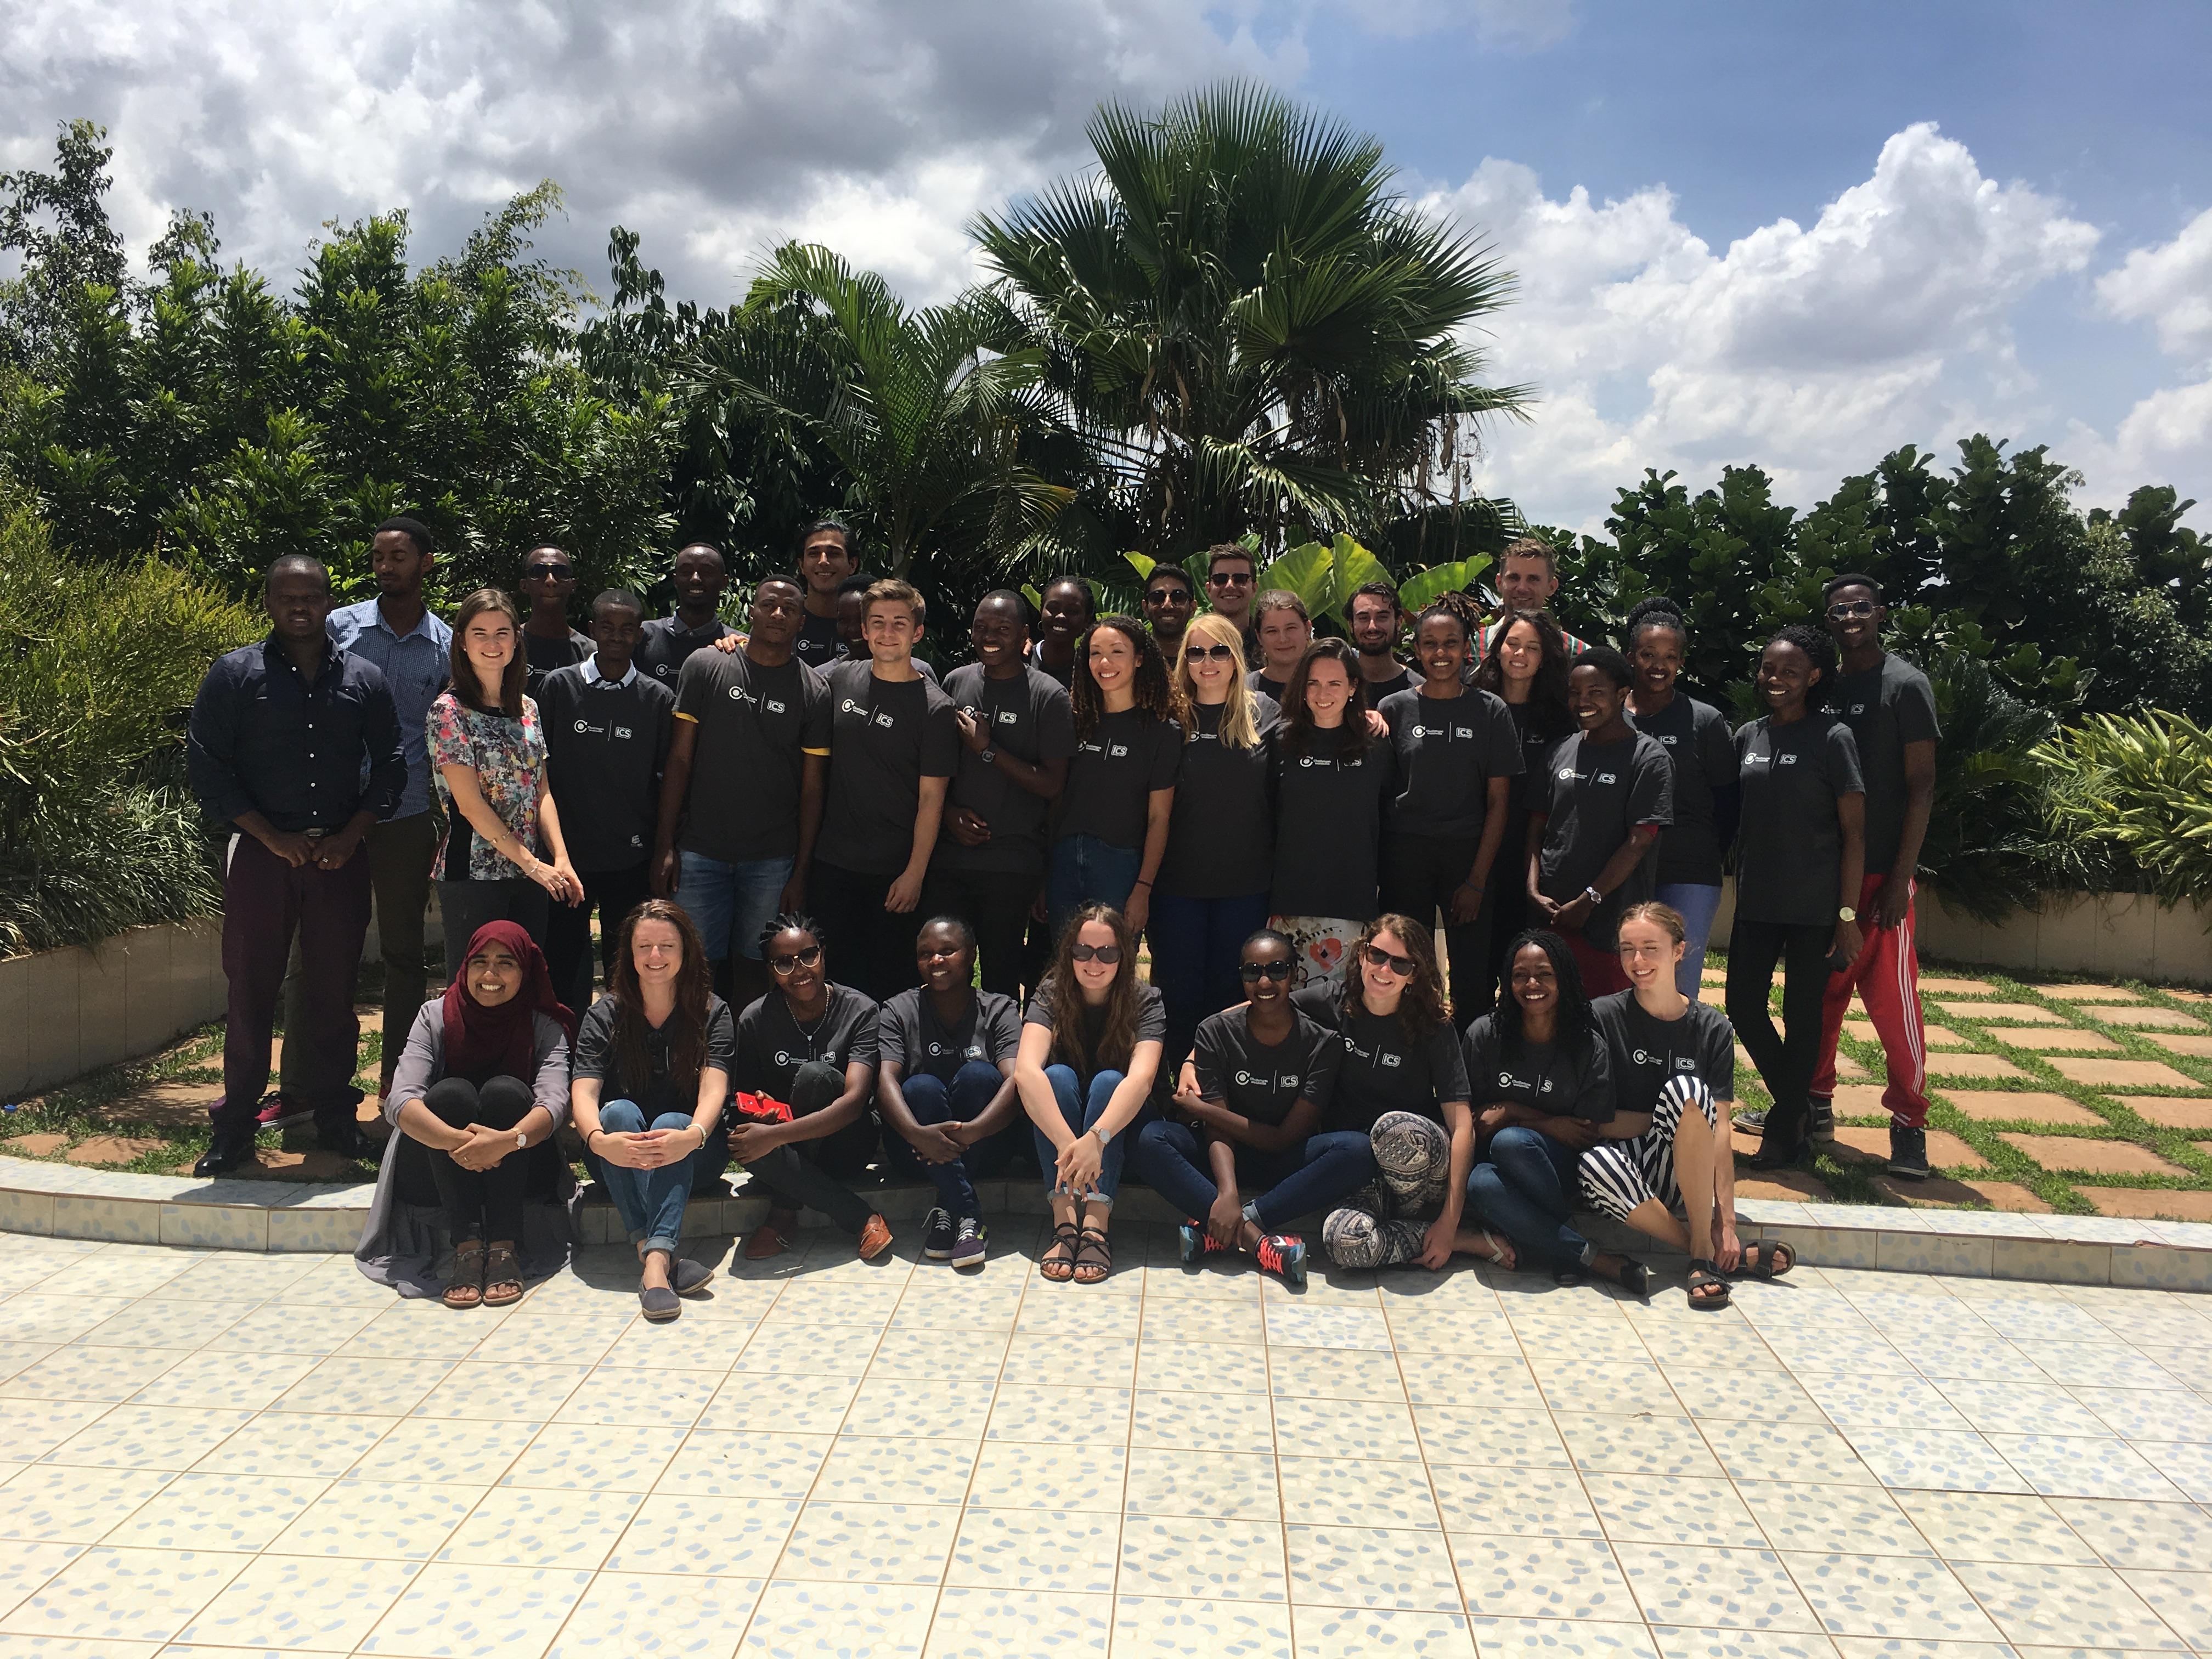 Meet the Team Kigali 2017